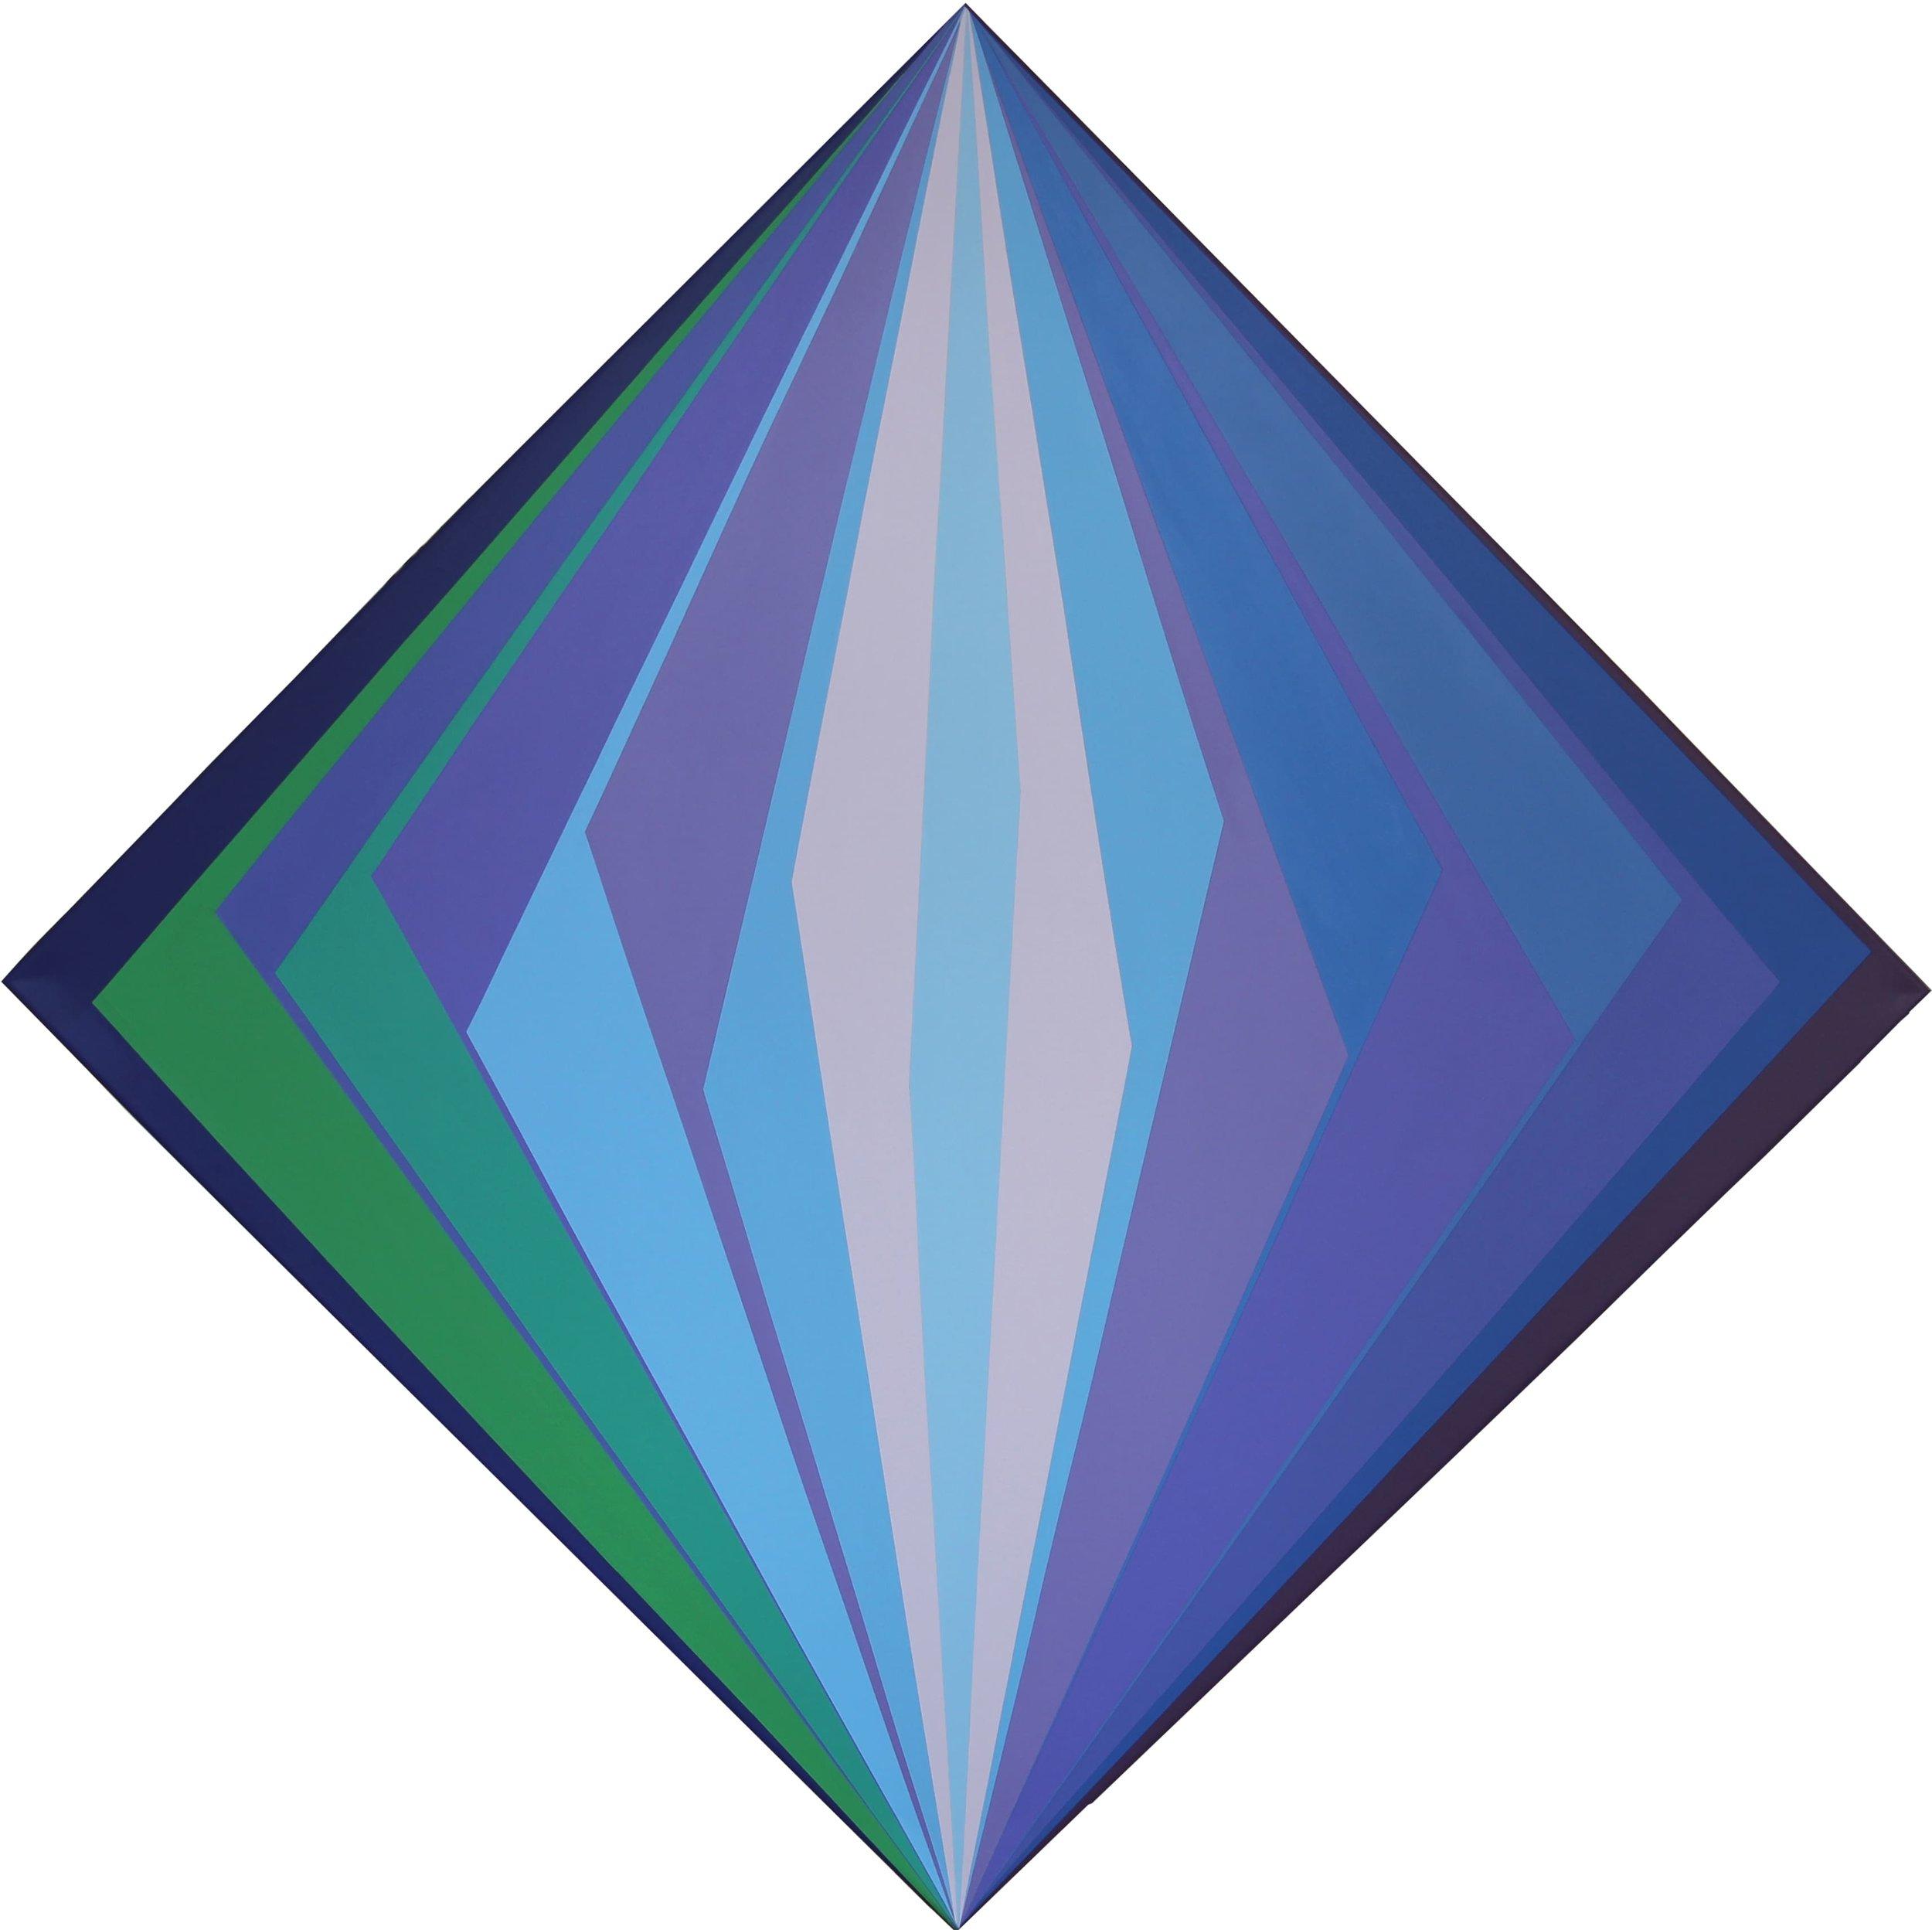 Geometric Composition, Acrylic Paint on Canvas, 2019